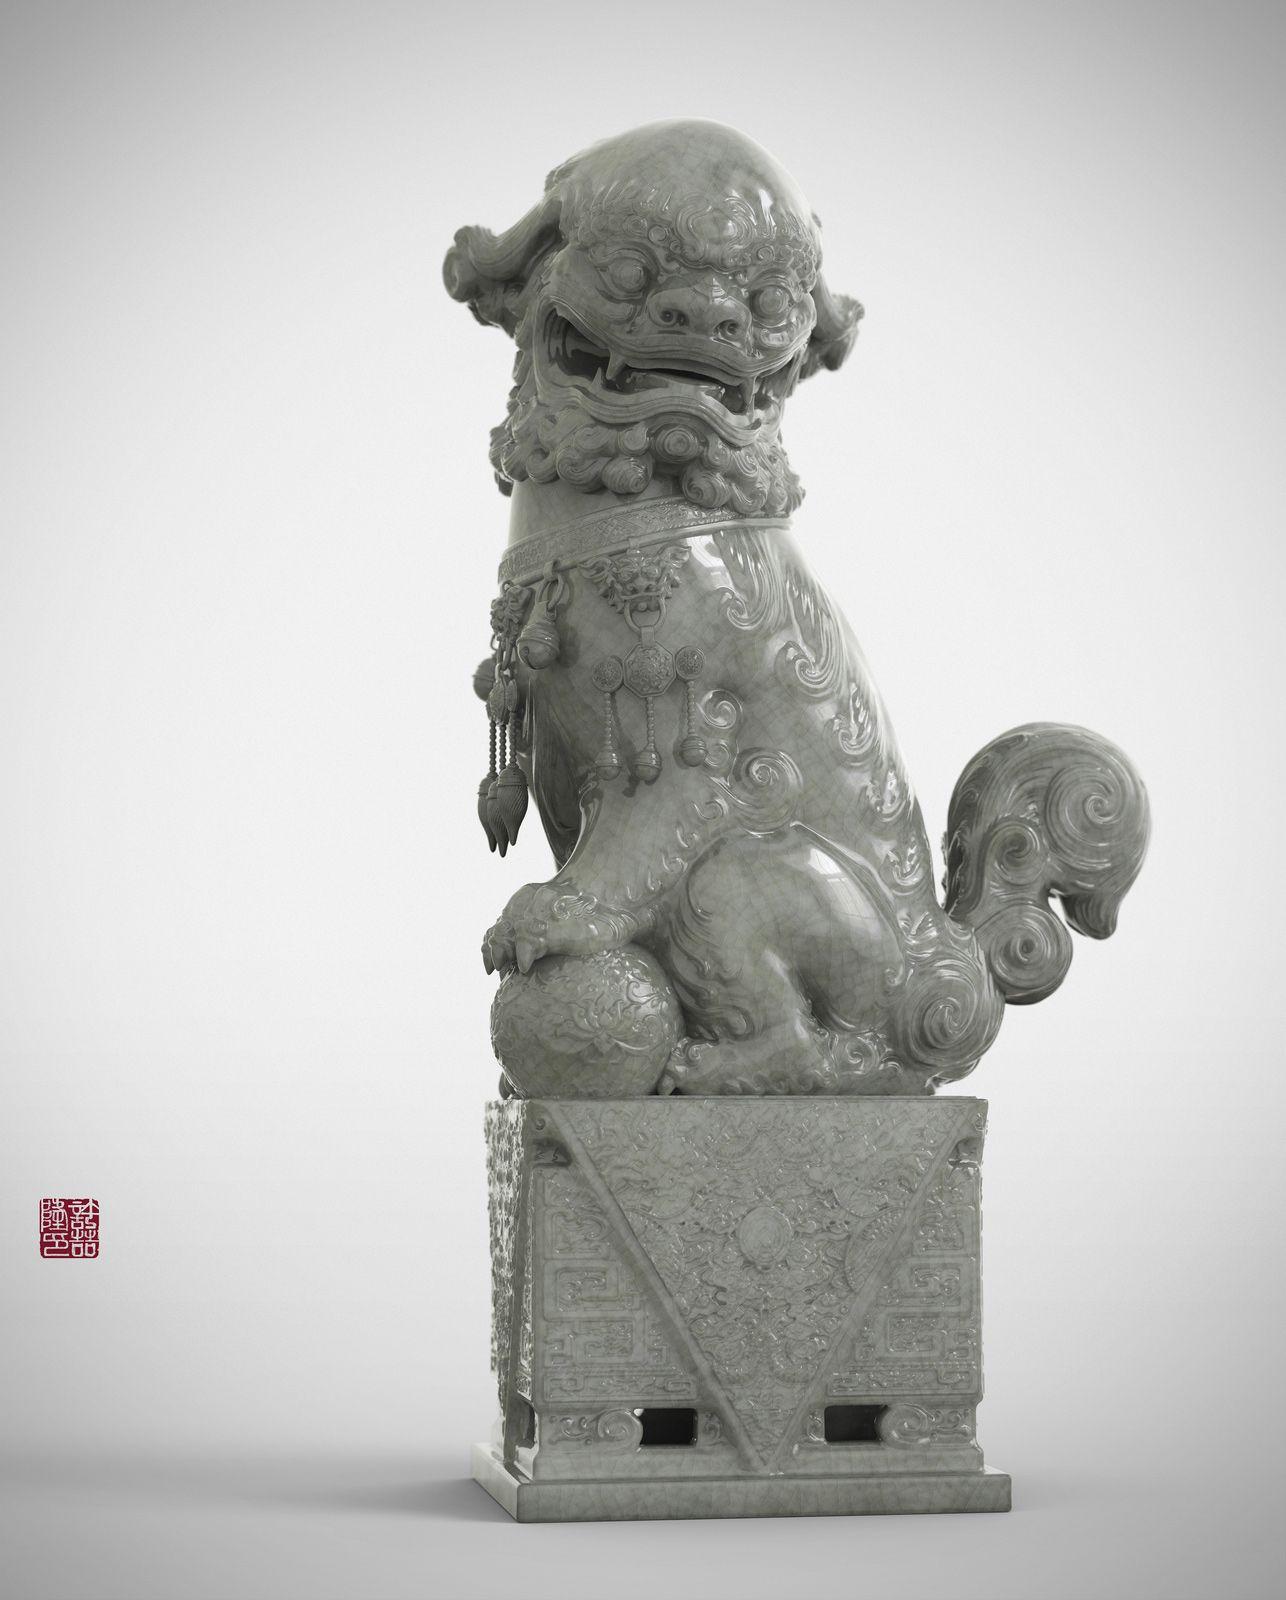 ZBrush sketchbook of Zhelong Xu Lion, Zbrush, Sculpture